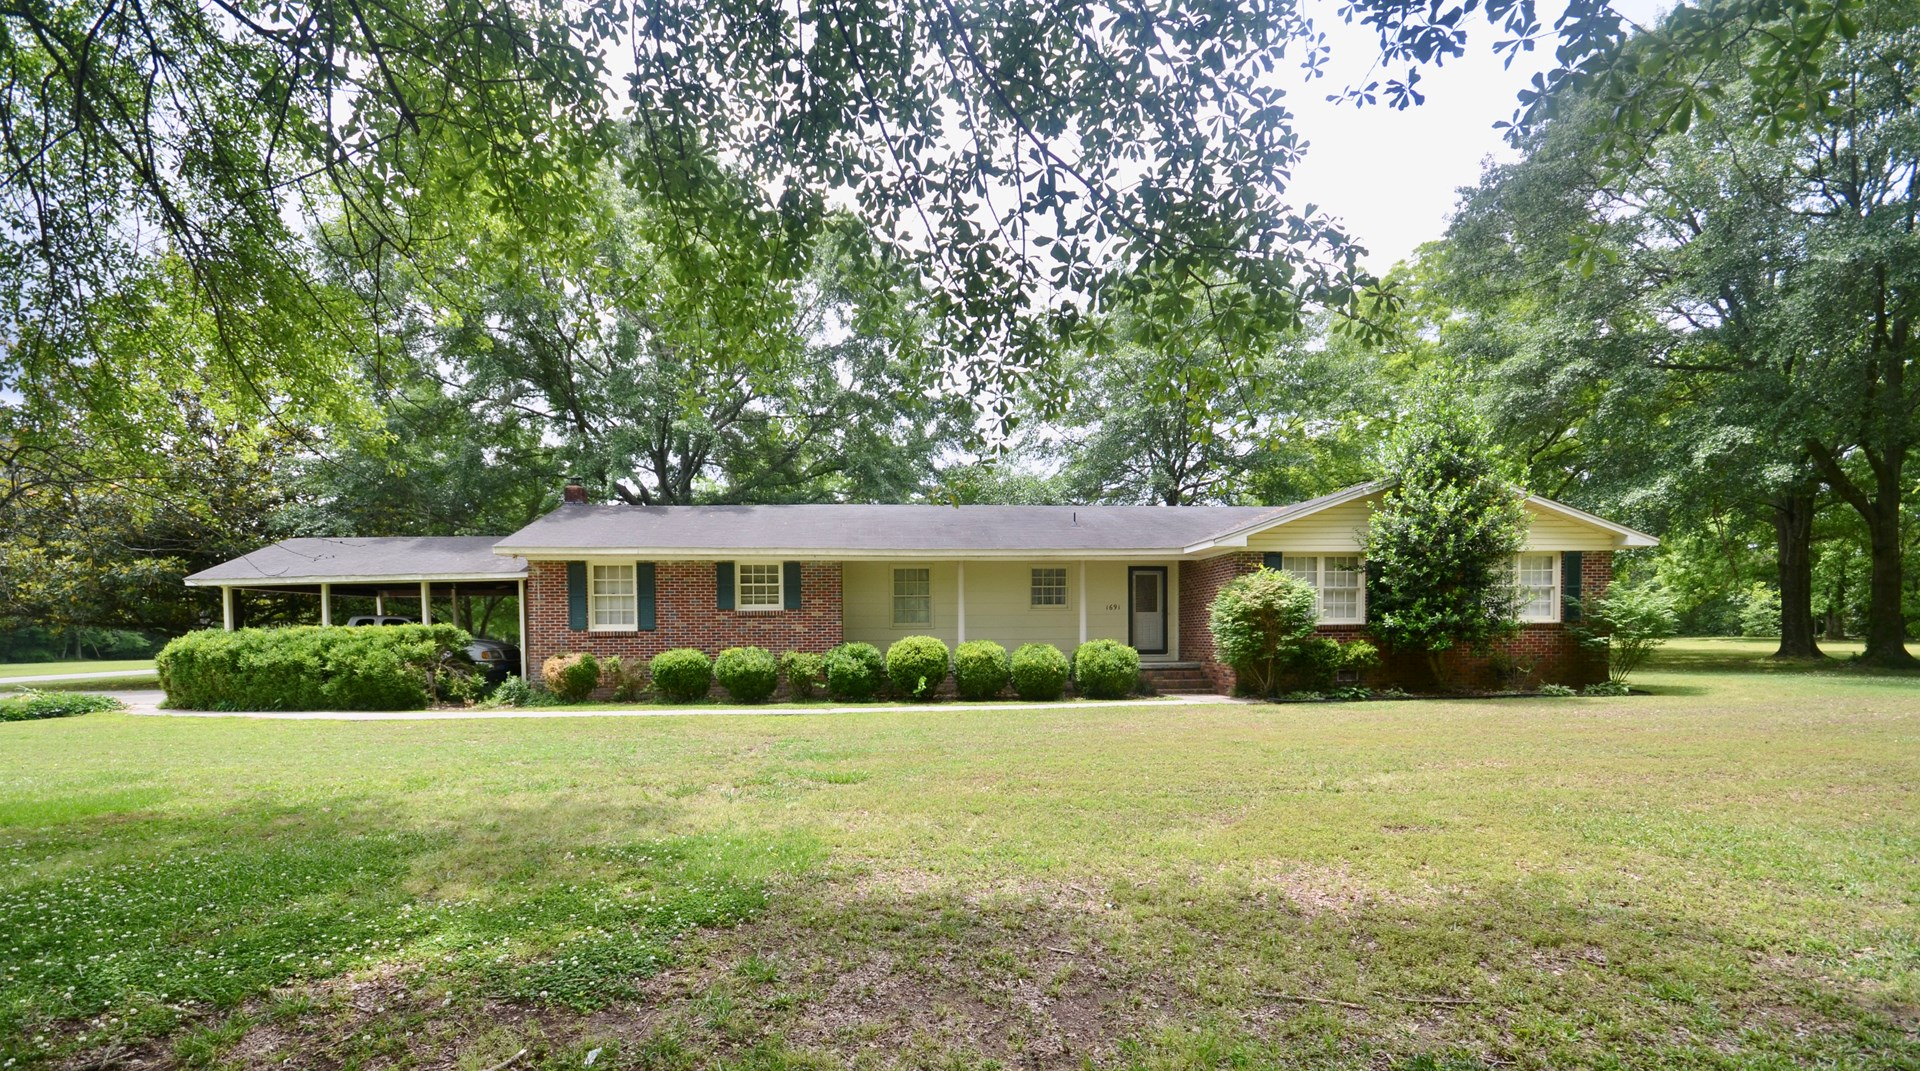 Hartselle Alabama home on 2.55 acres